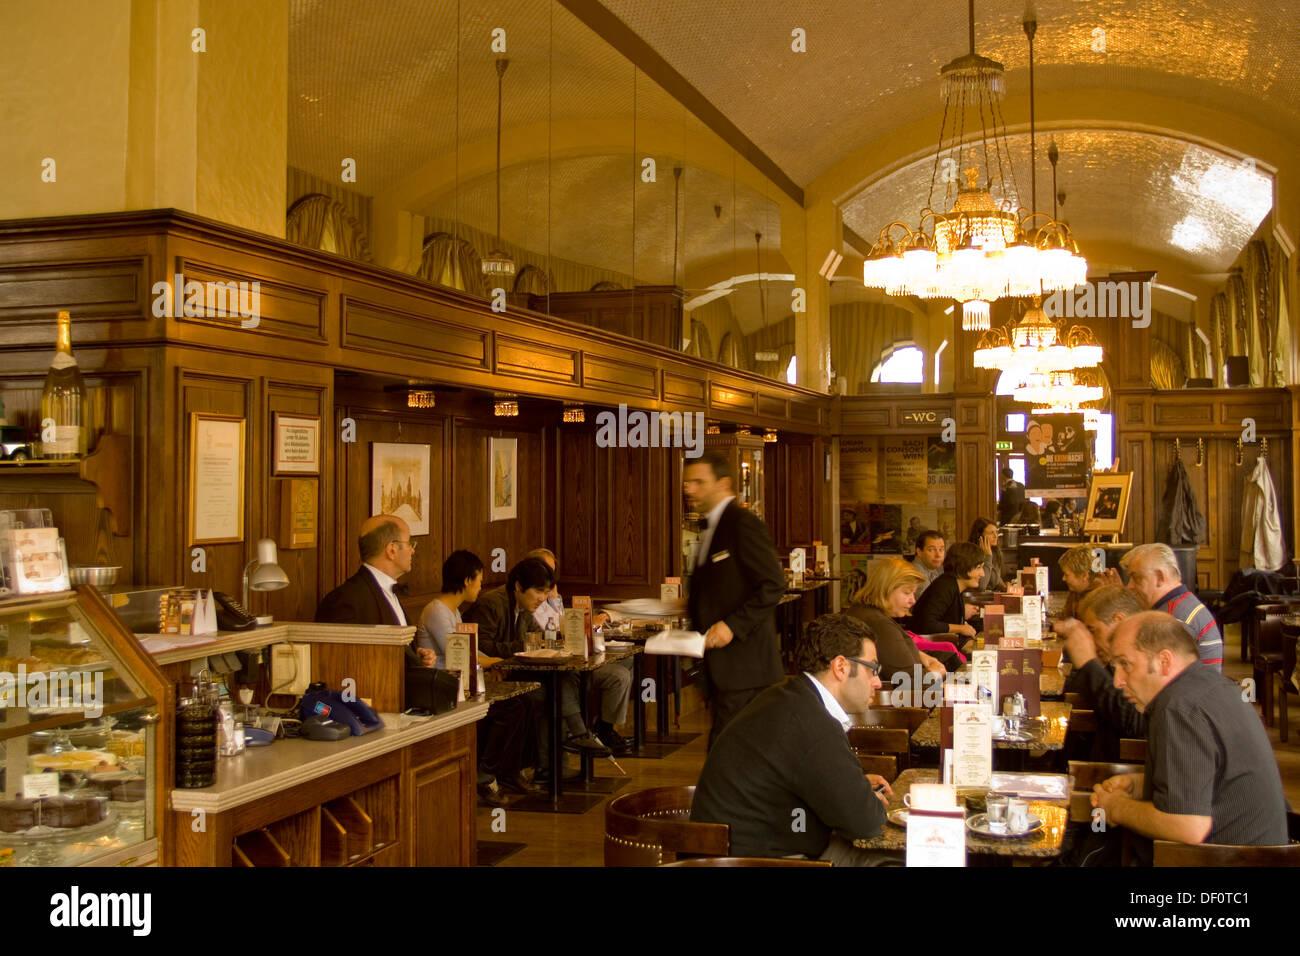 sterreich wien 1 k rntner ring 17 cafe schwarzenberg stock photo royalty free image. Black Bedroom Furniture Sets. Home Design Ideas